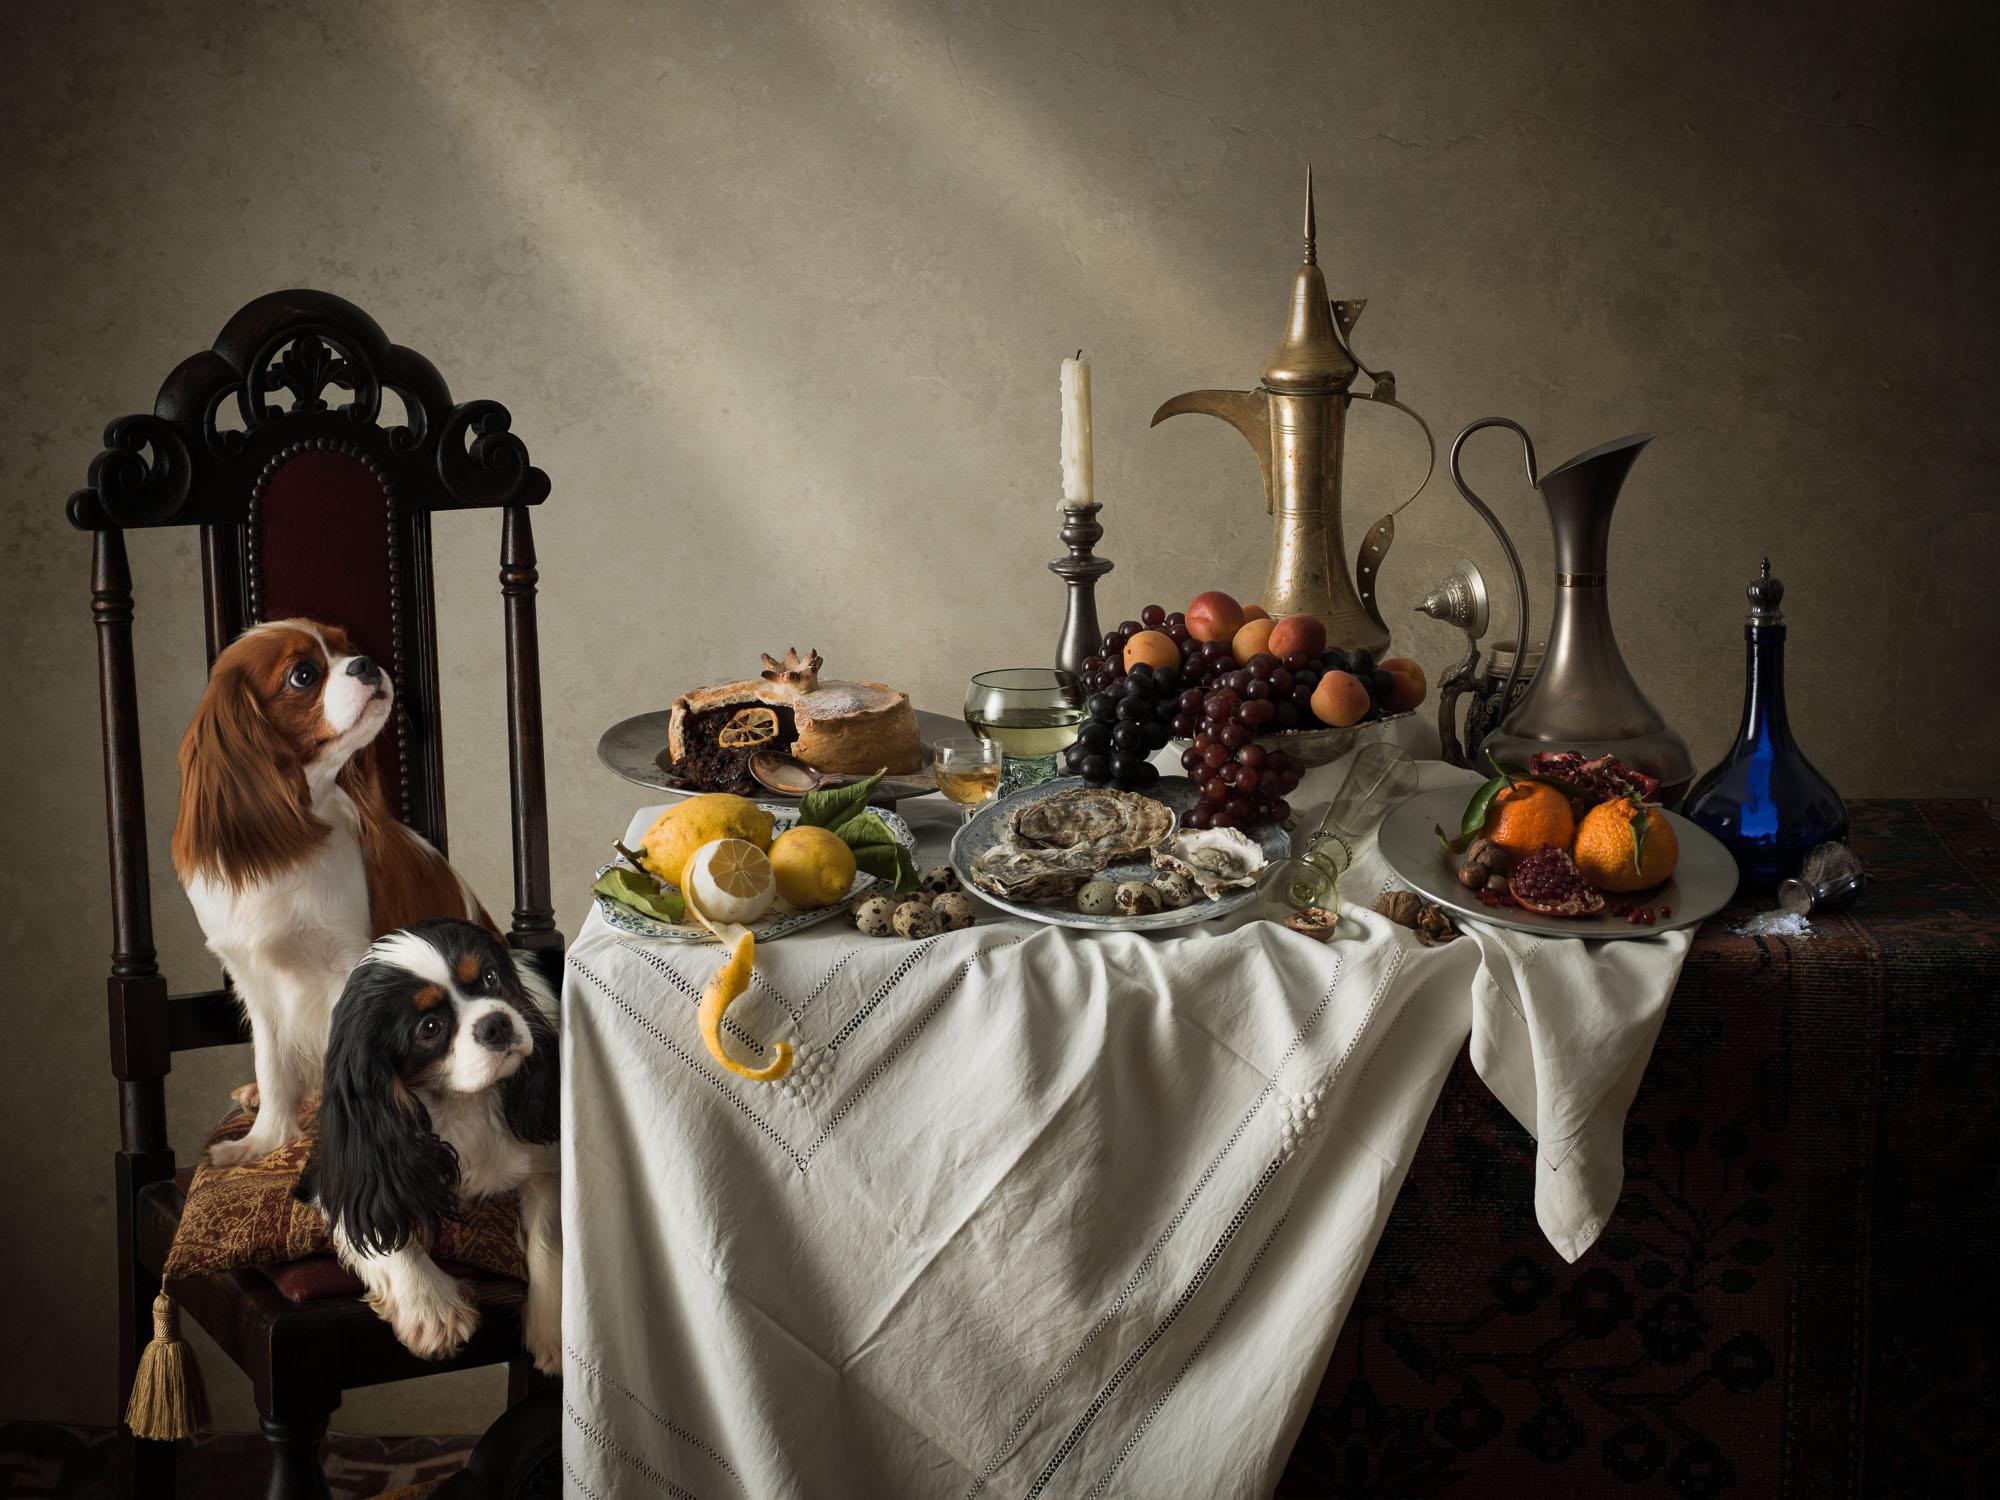 Time Platt - Dog at banquet